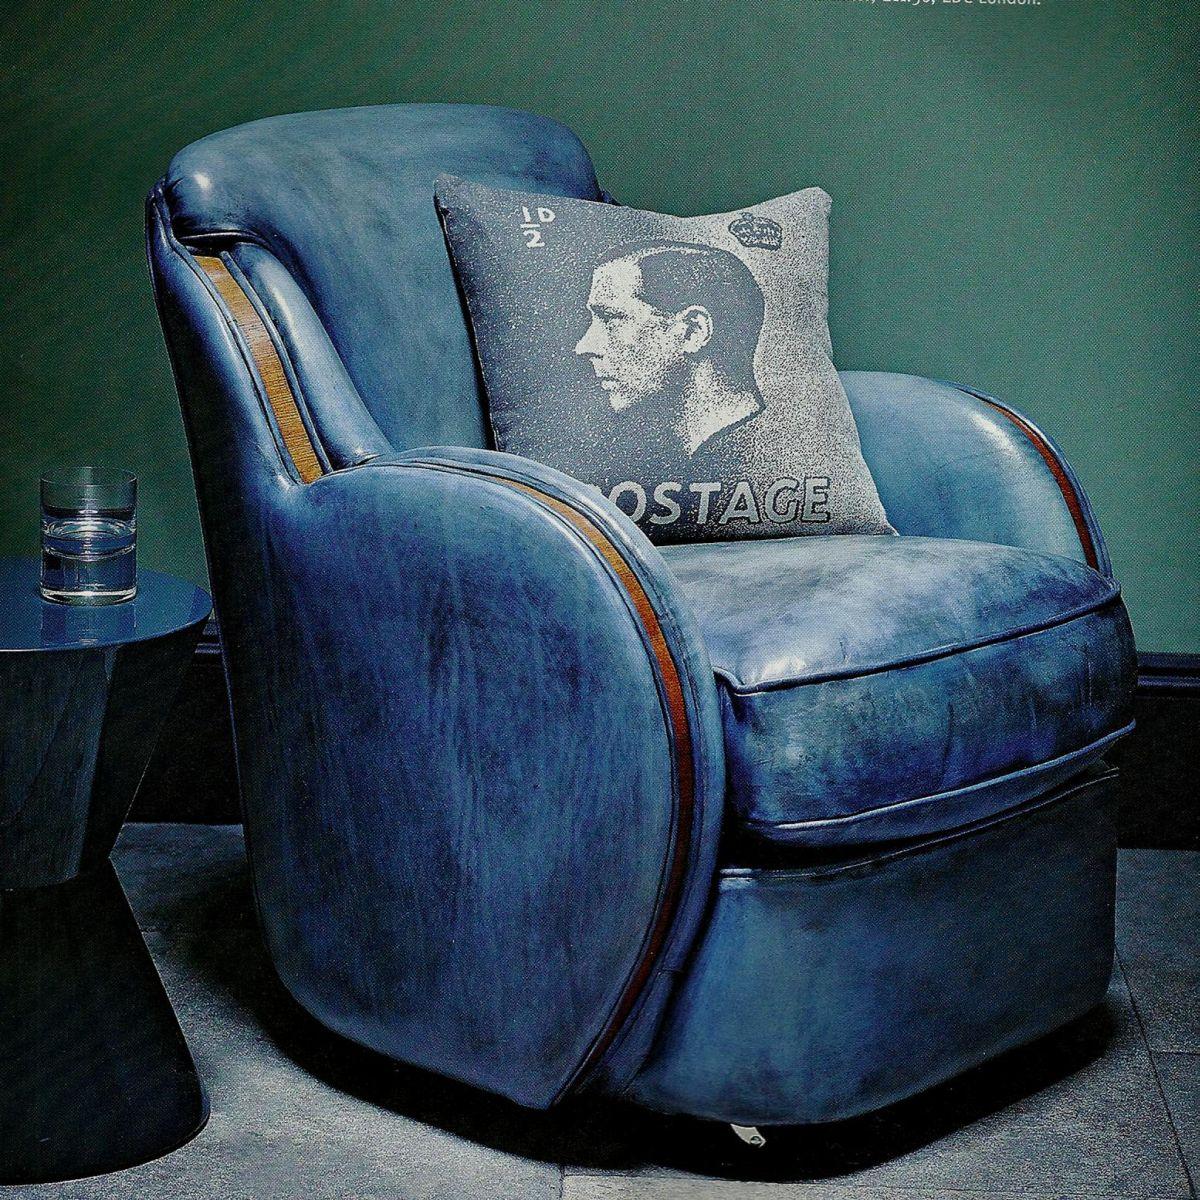 September 2011: She Moves The Furniture: Gentlemen's Club